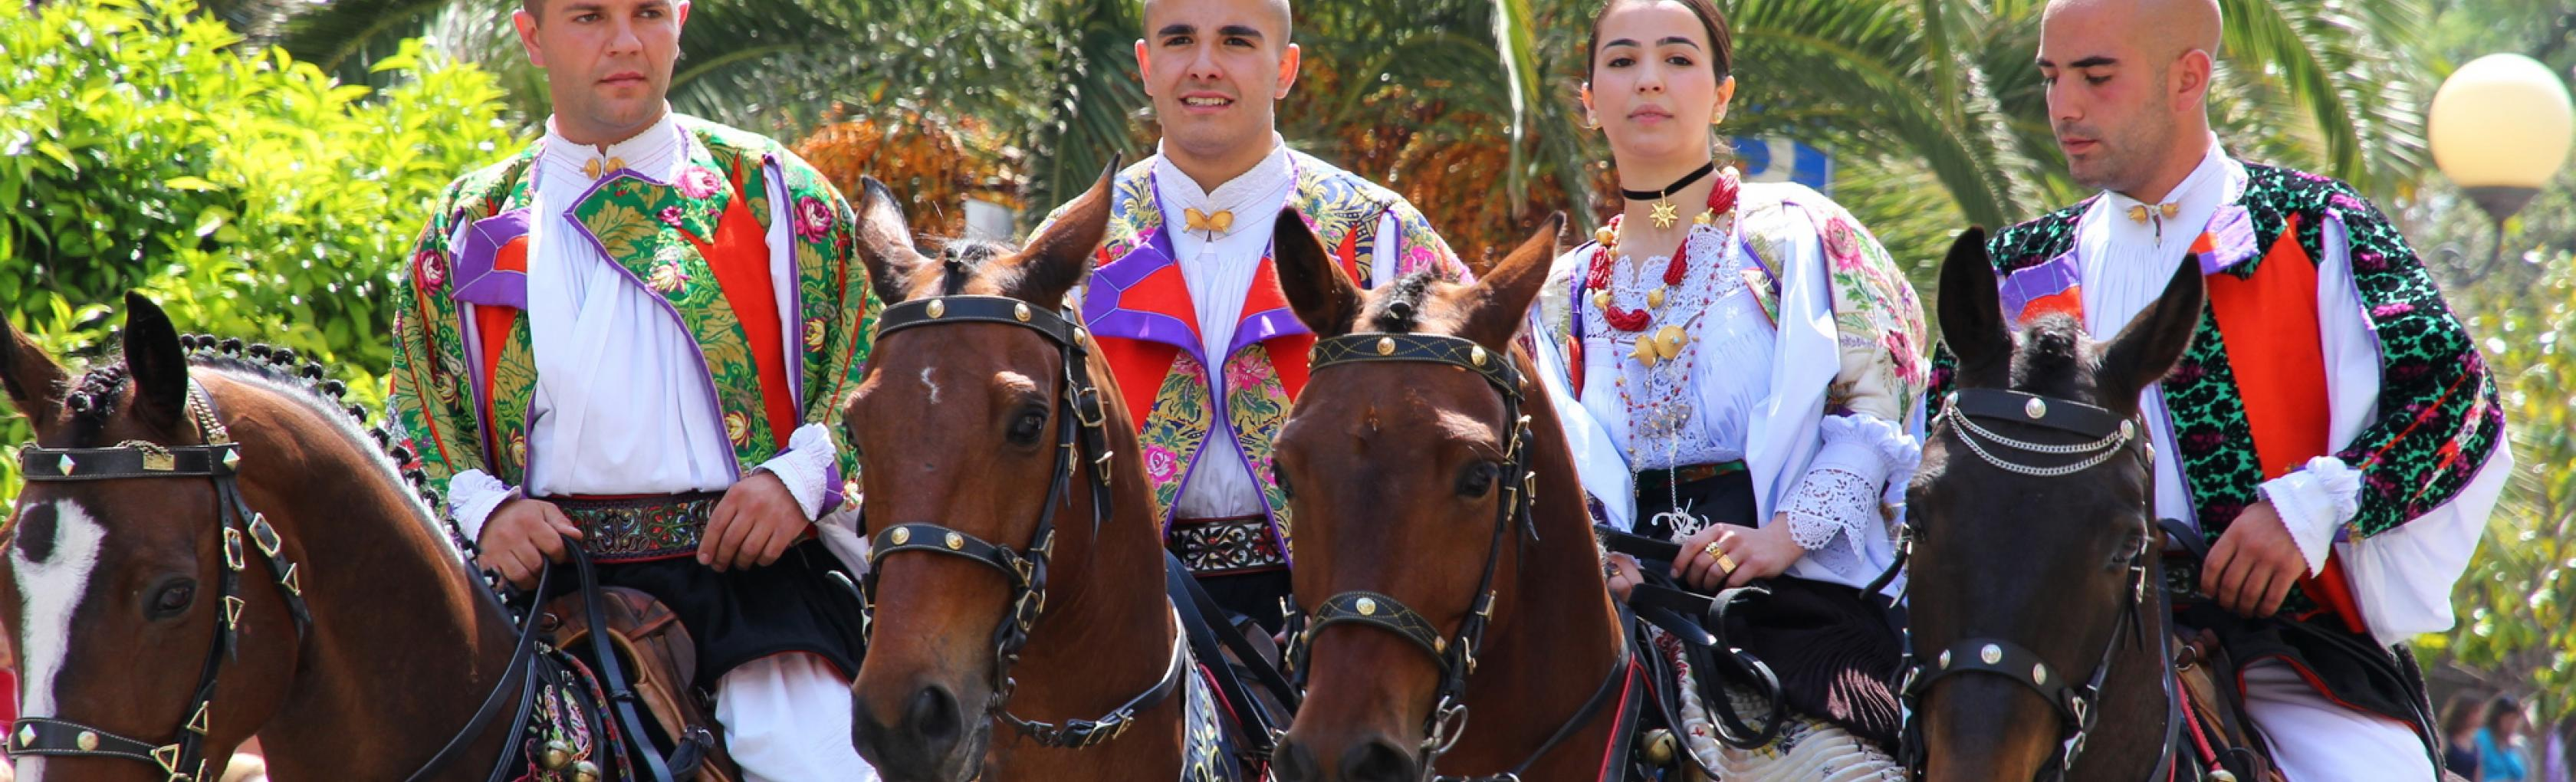 Cavalieri di Oliena - Cavalcata sarda